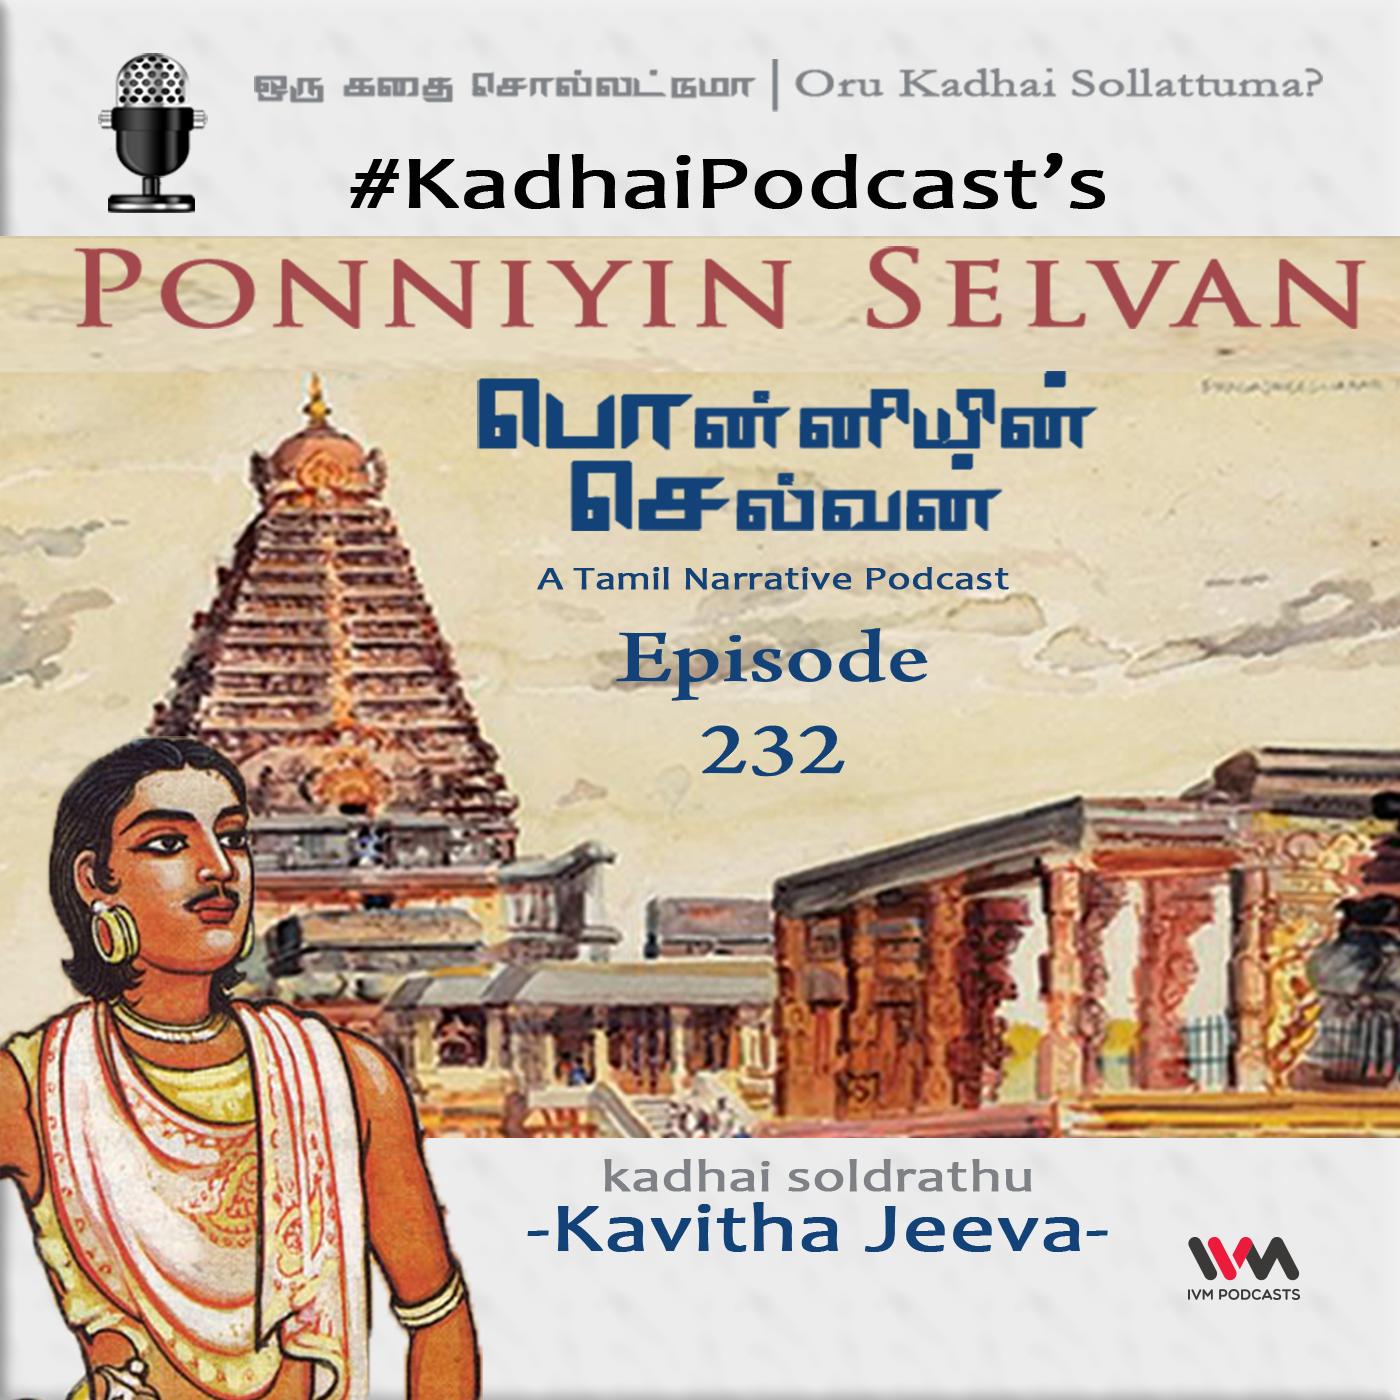 KadhaiPodcast's Ponniyin Selvan - Episode # 232